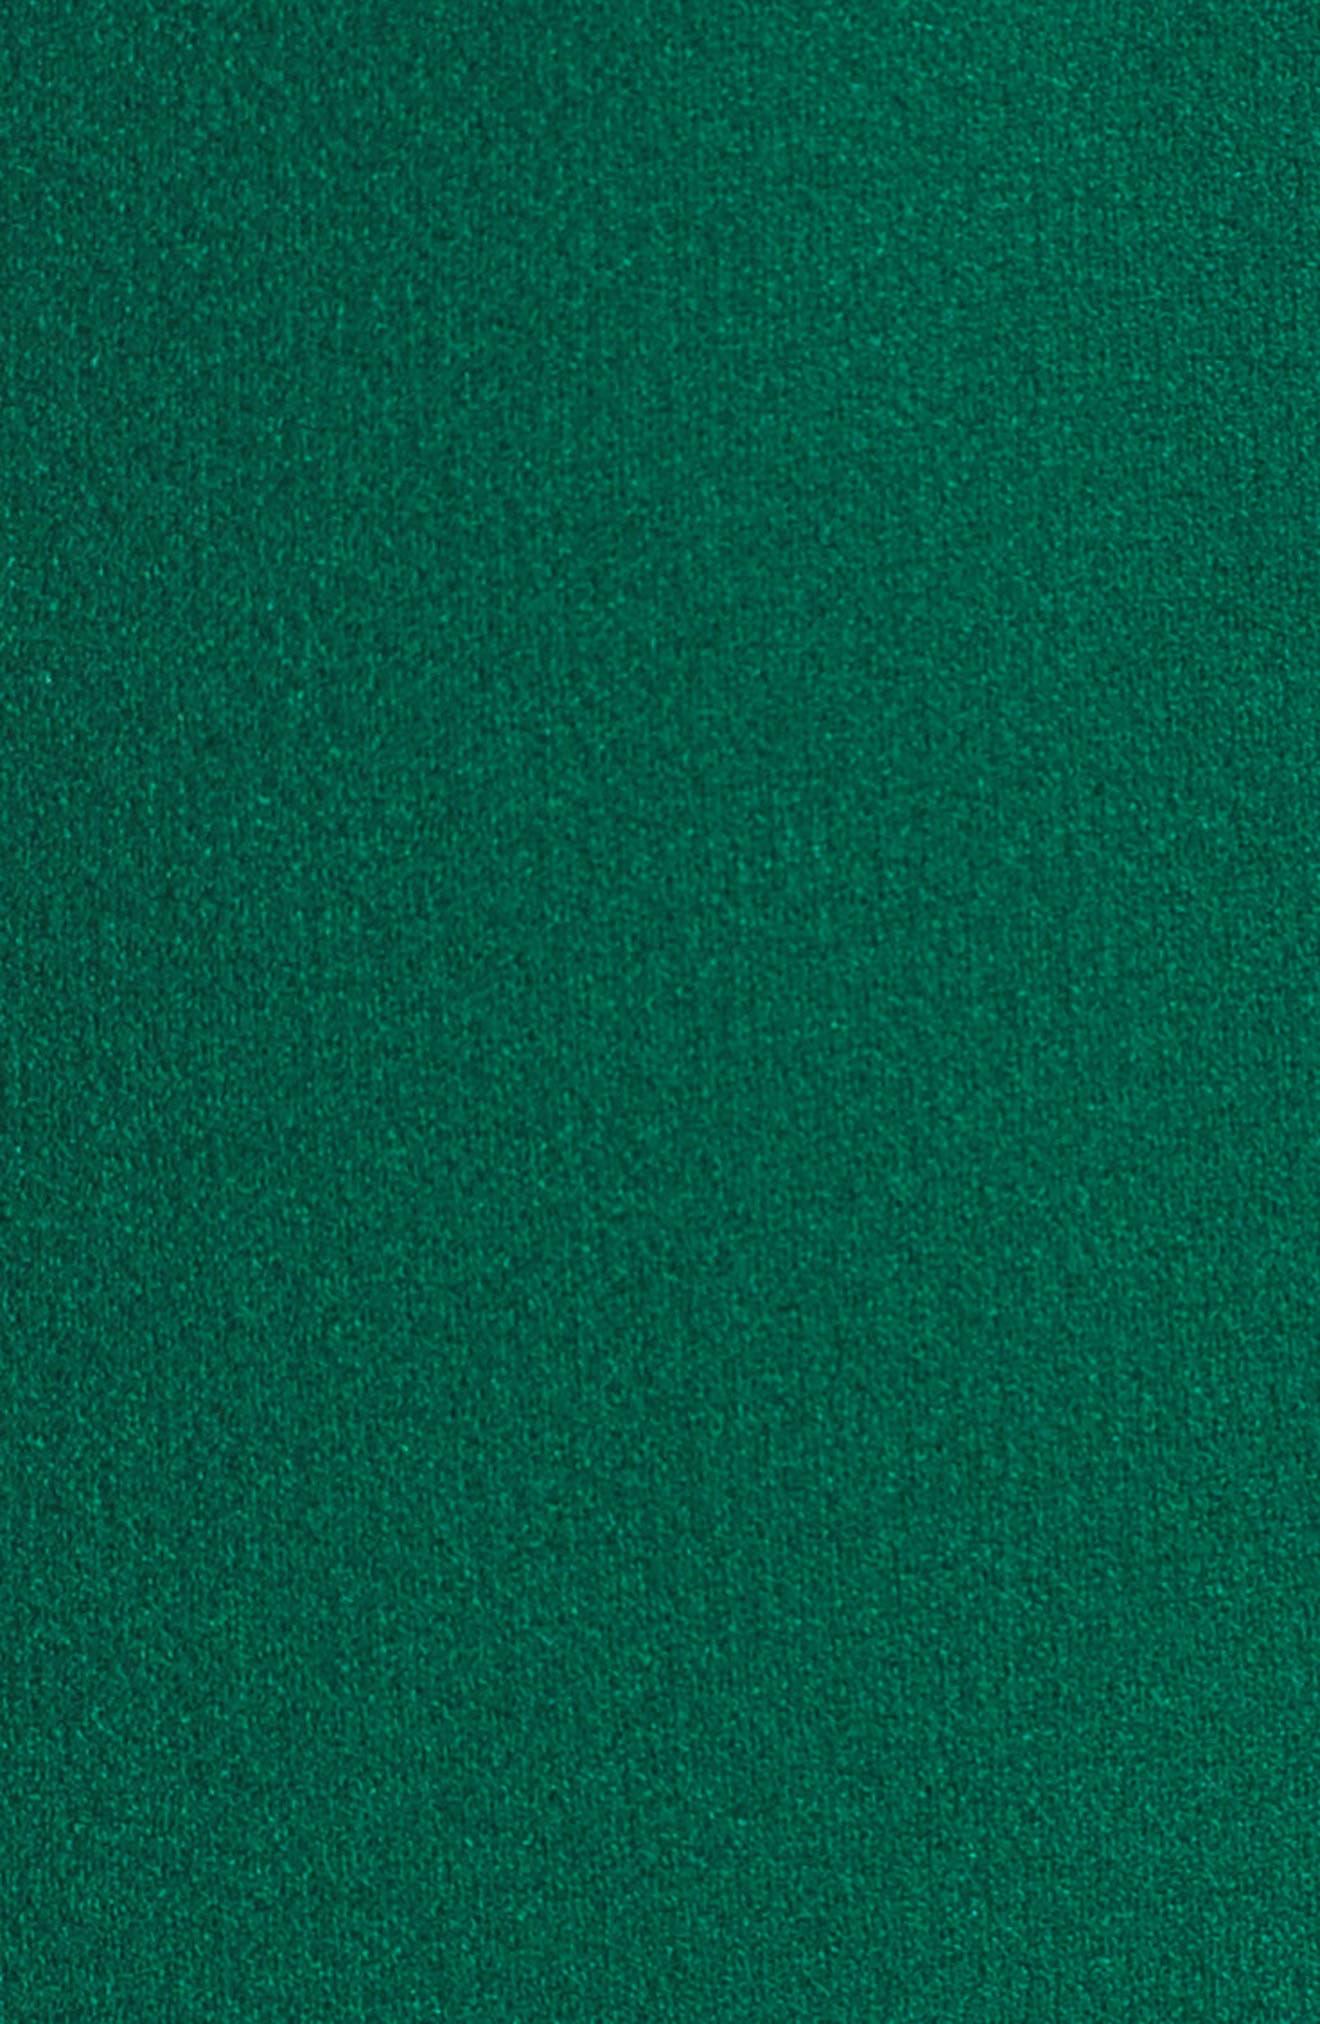 Hailey Crepe Dress,                             Alternate thumbnail 151, color,